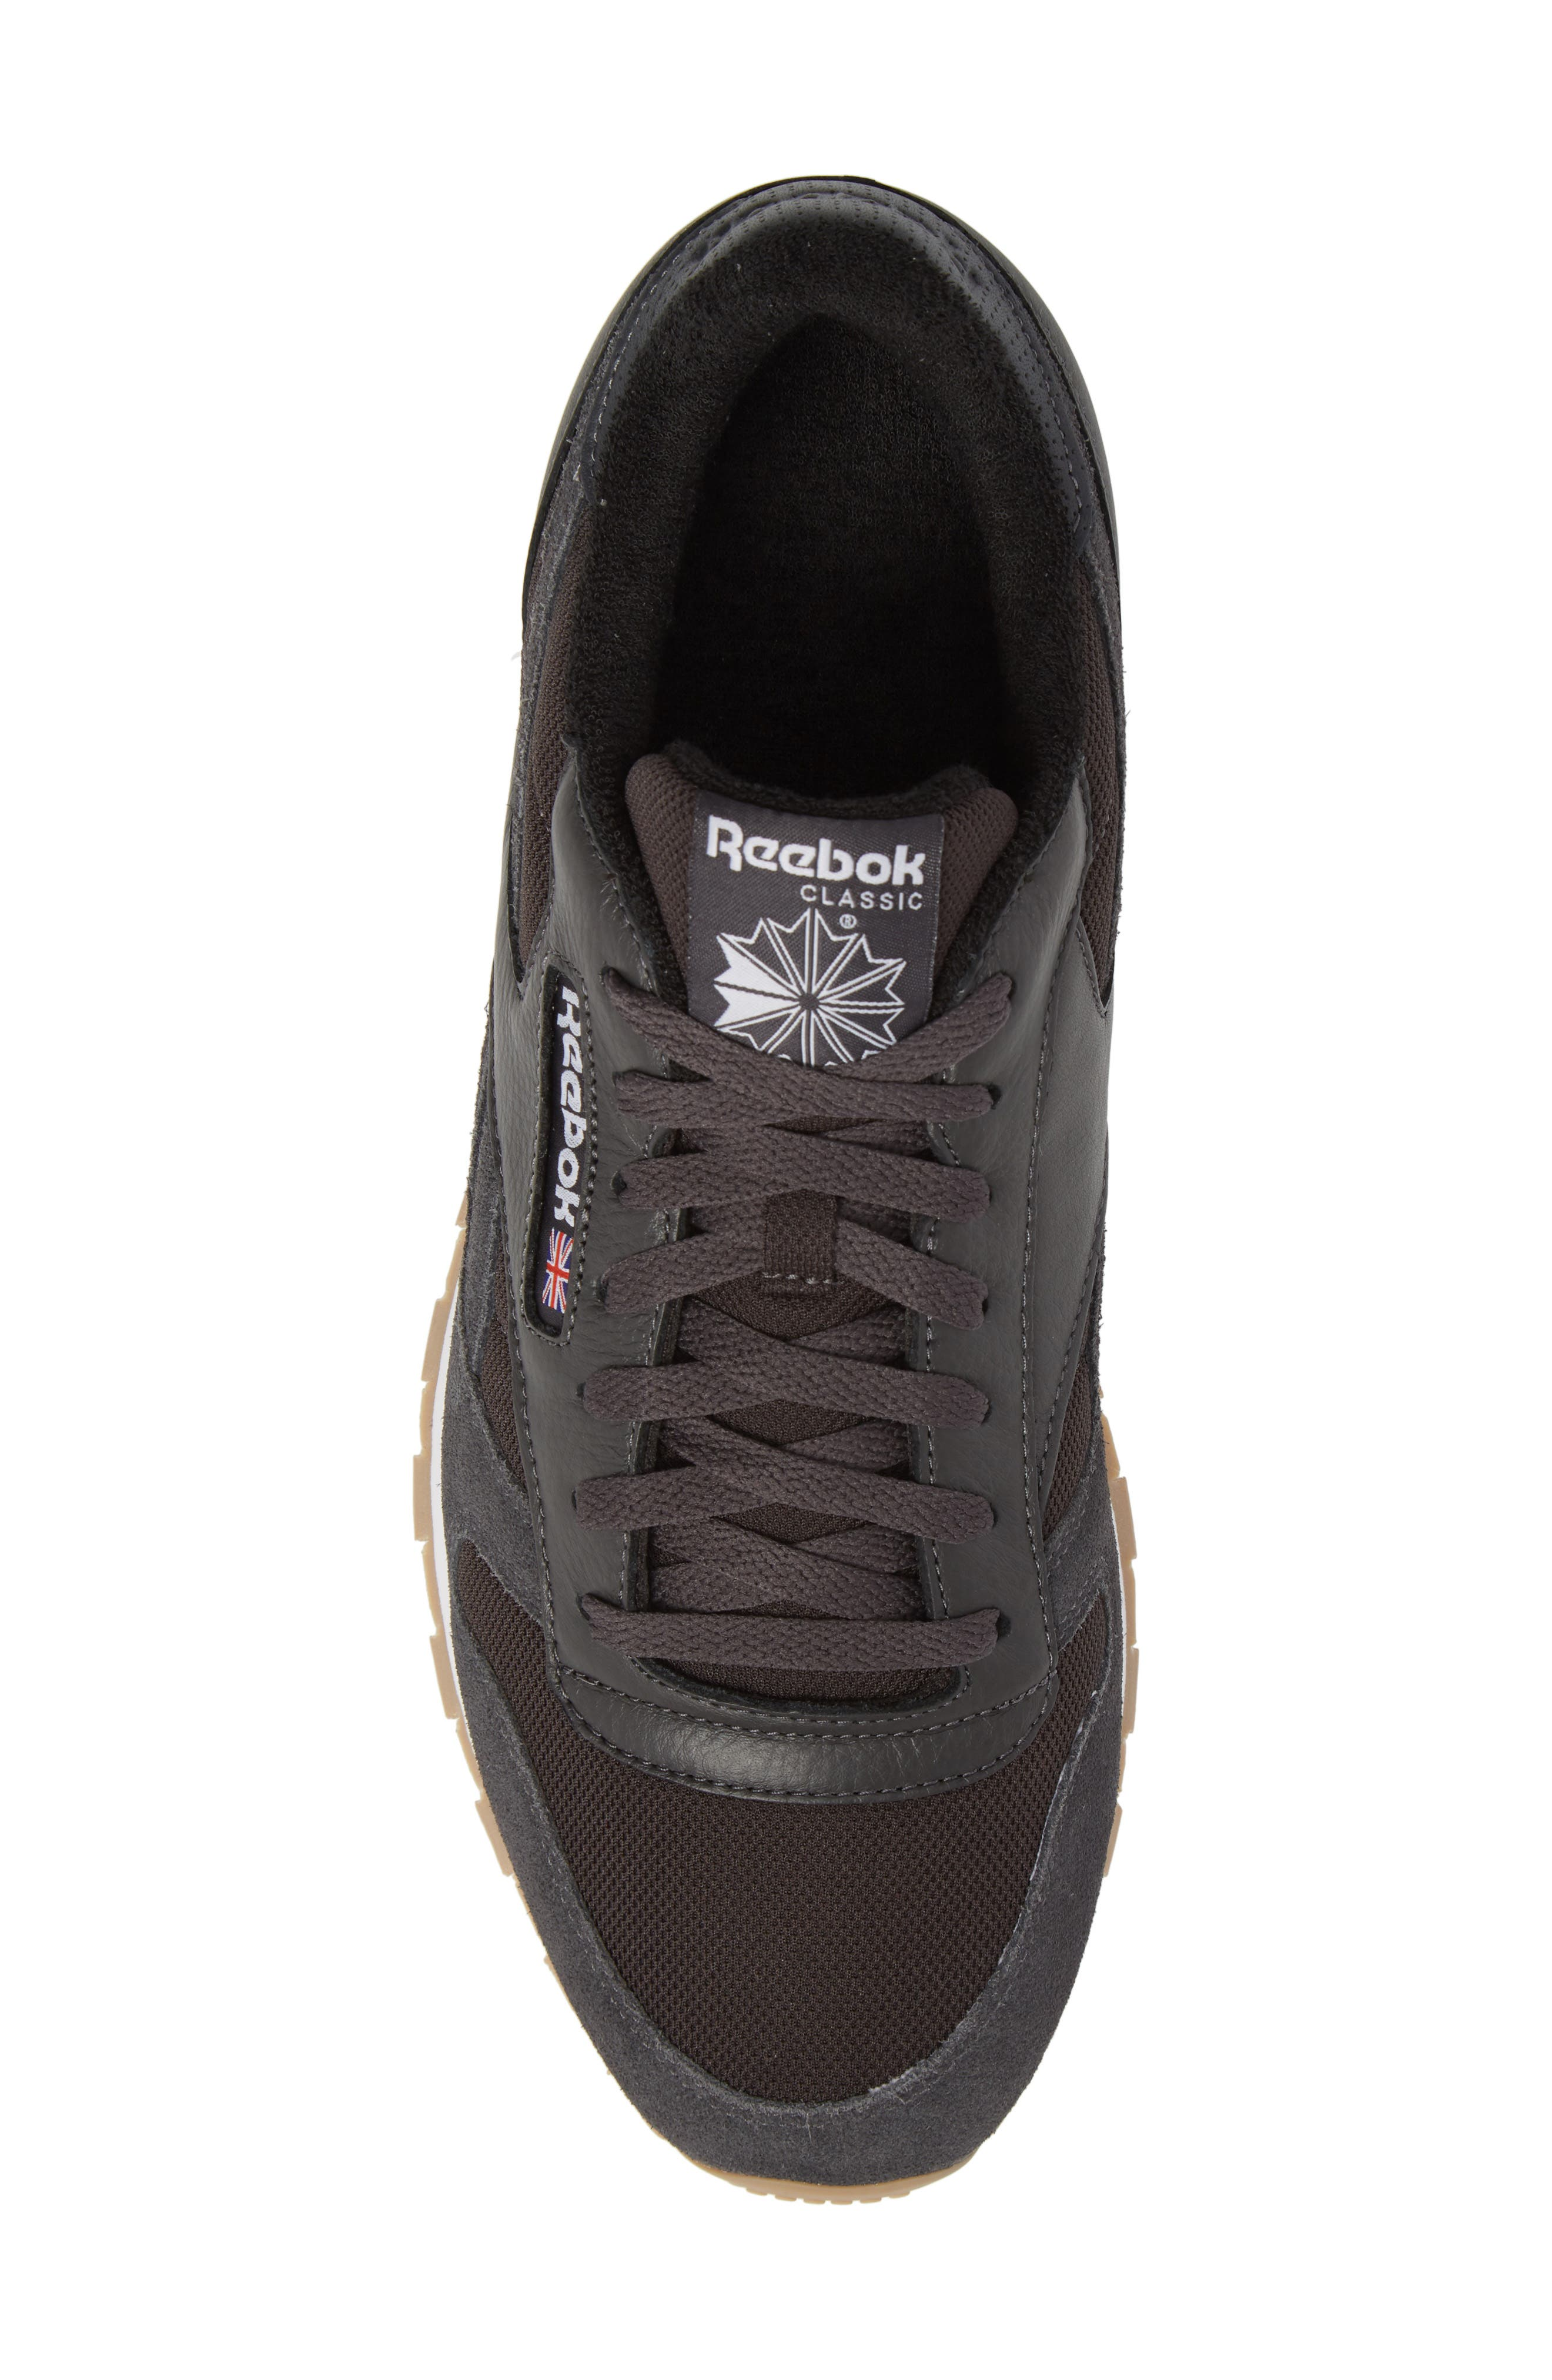 ESTL Classic Leather Sneaker,                             Alternate thumbnail 5, color,                             001